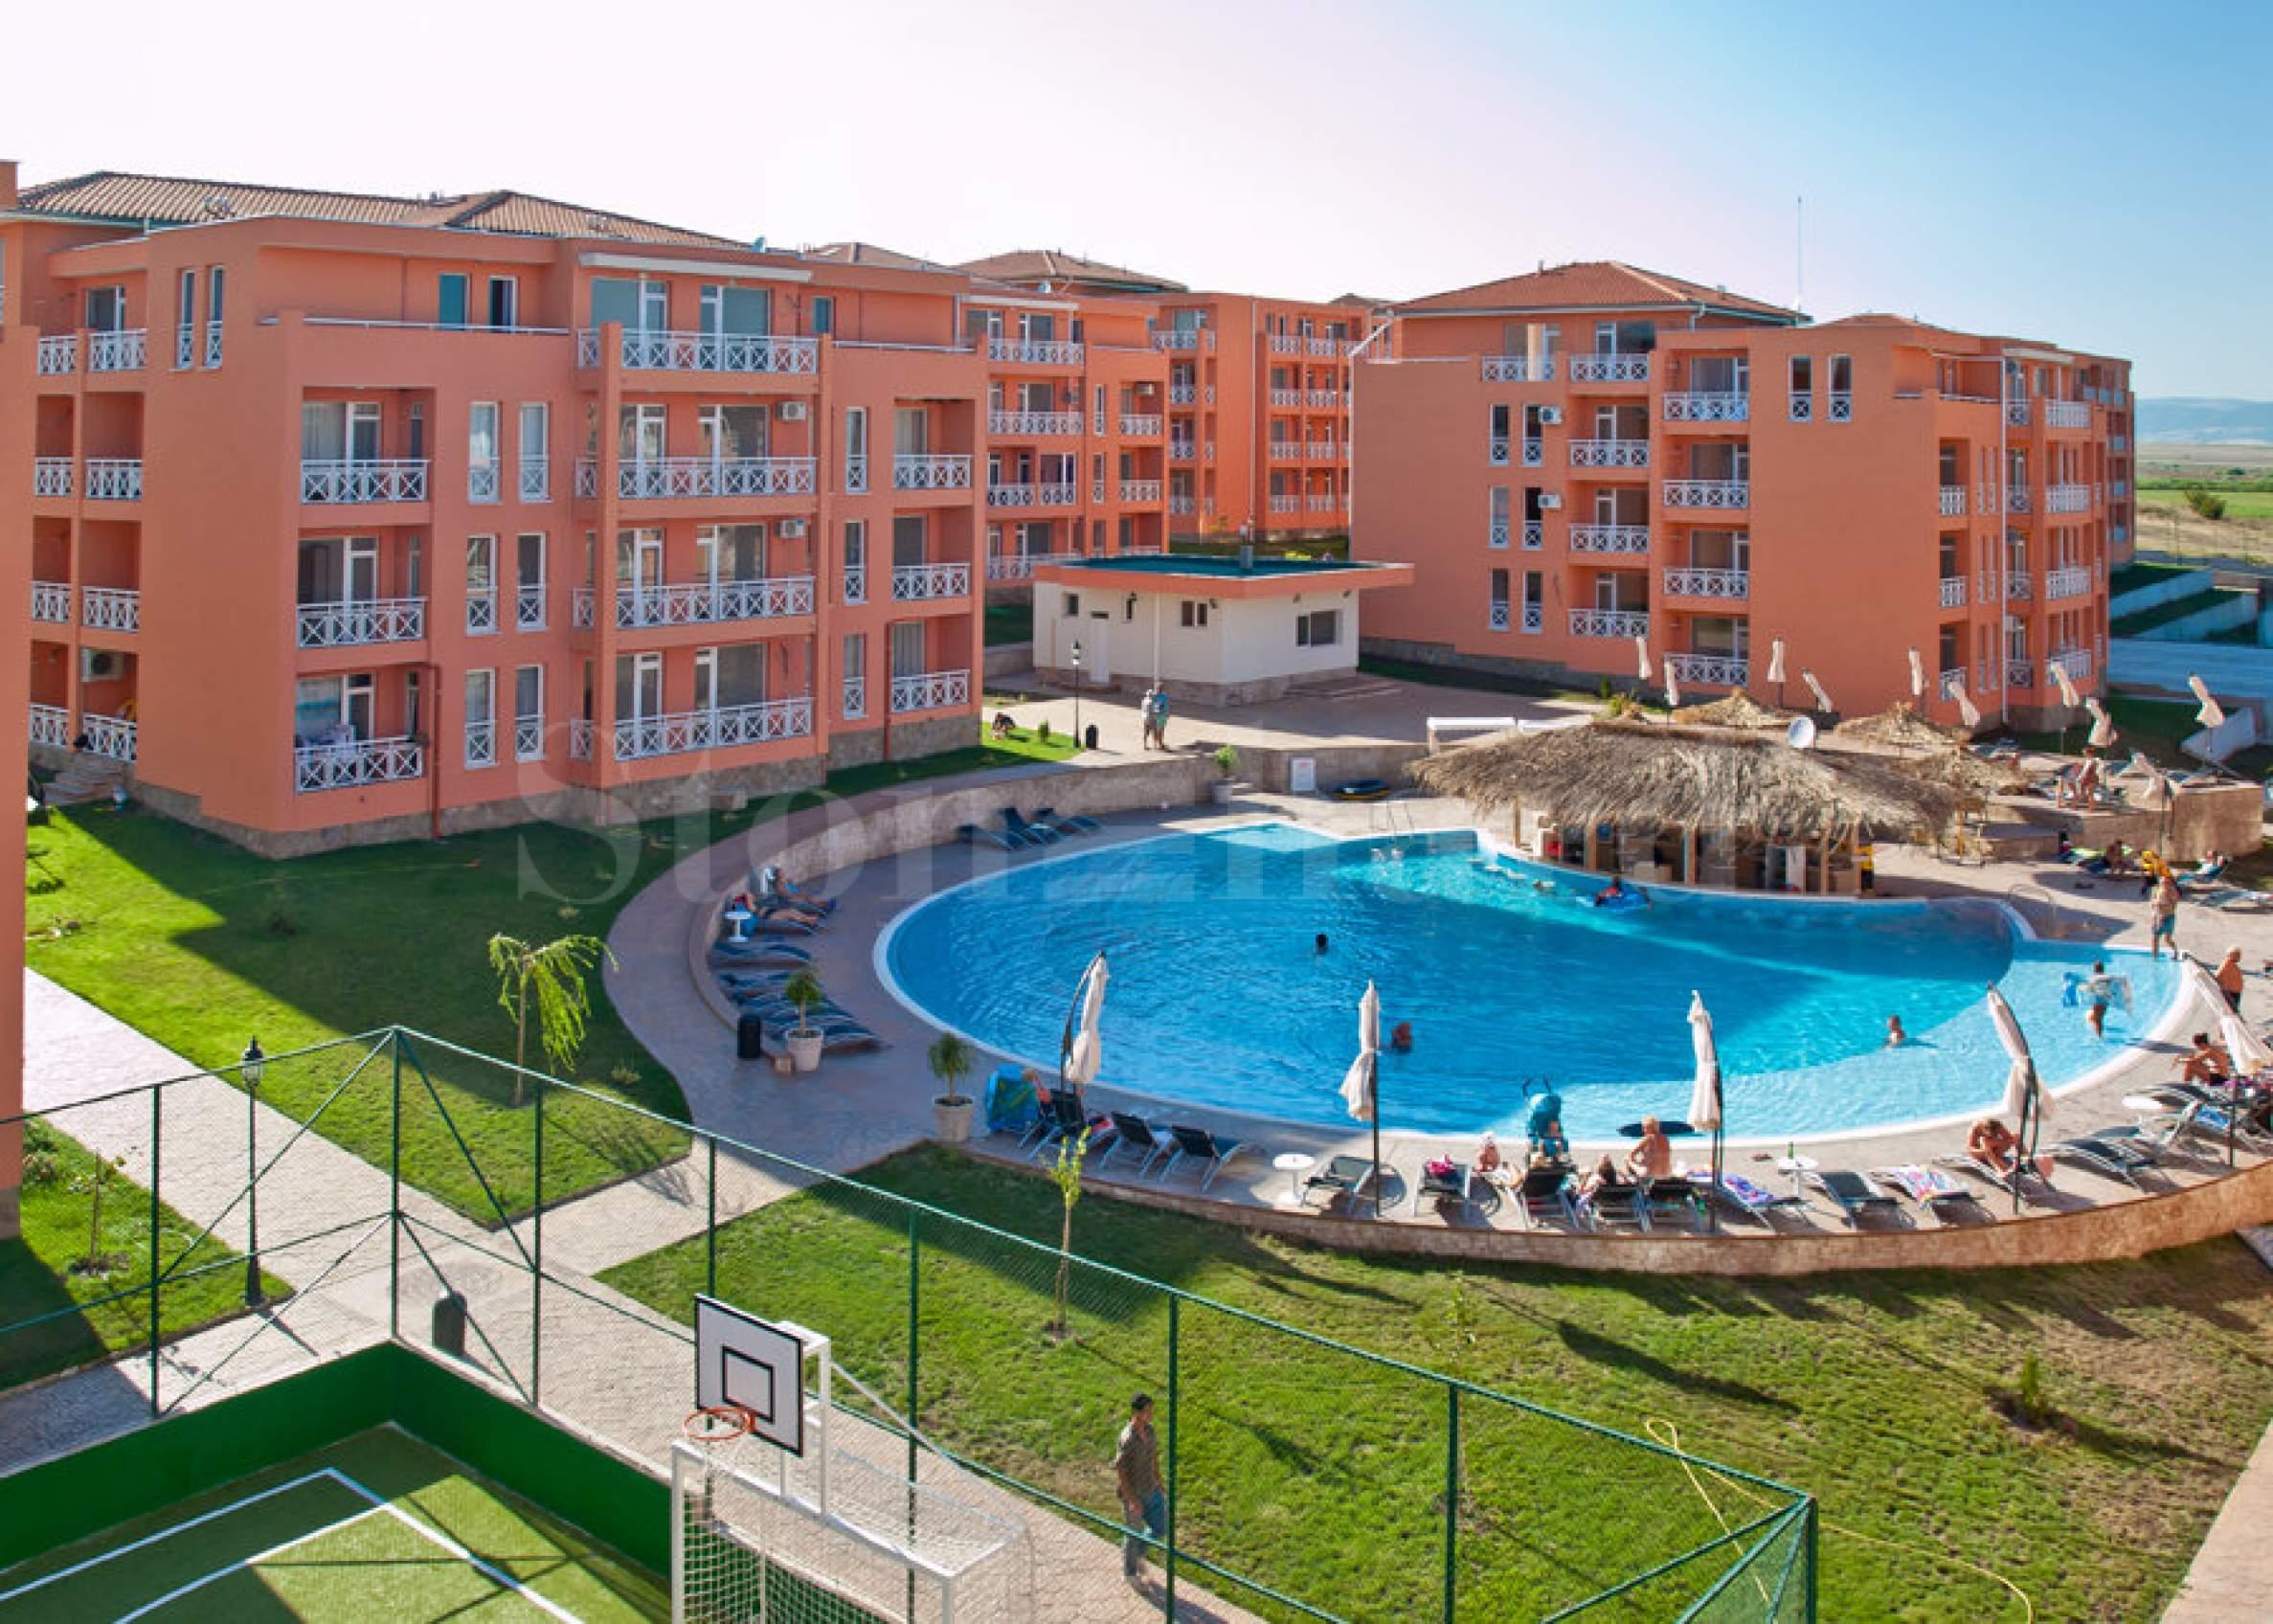 Apartments at attractive prices near popular beach resort1 - Stonehard